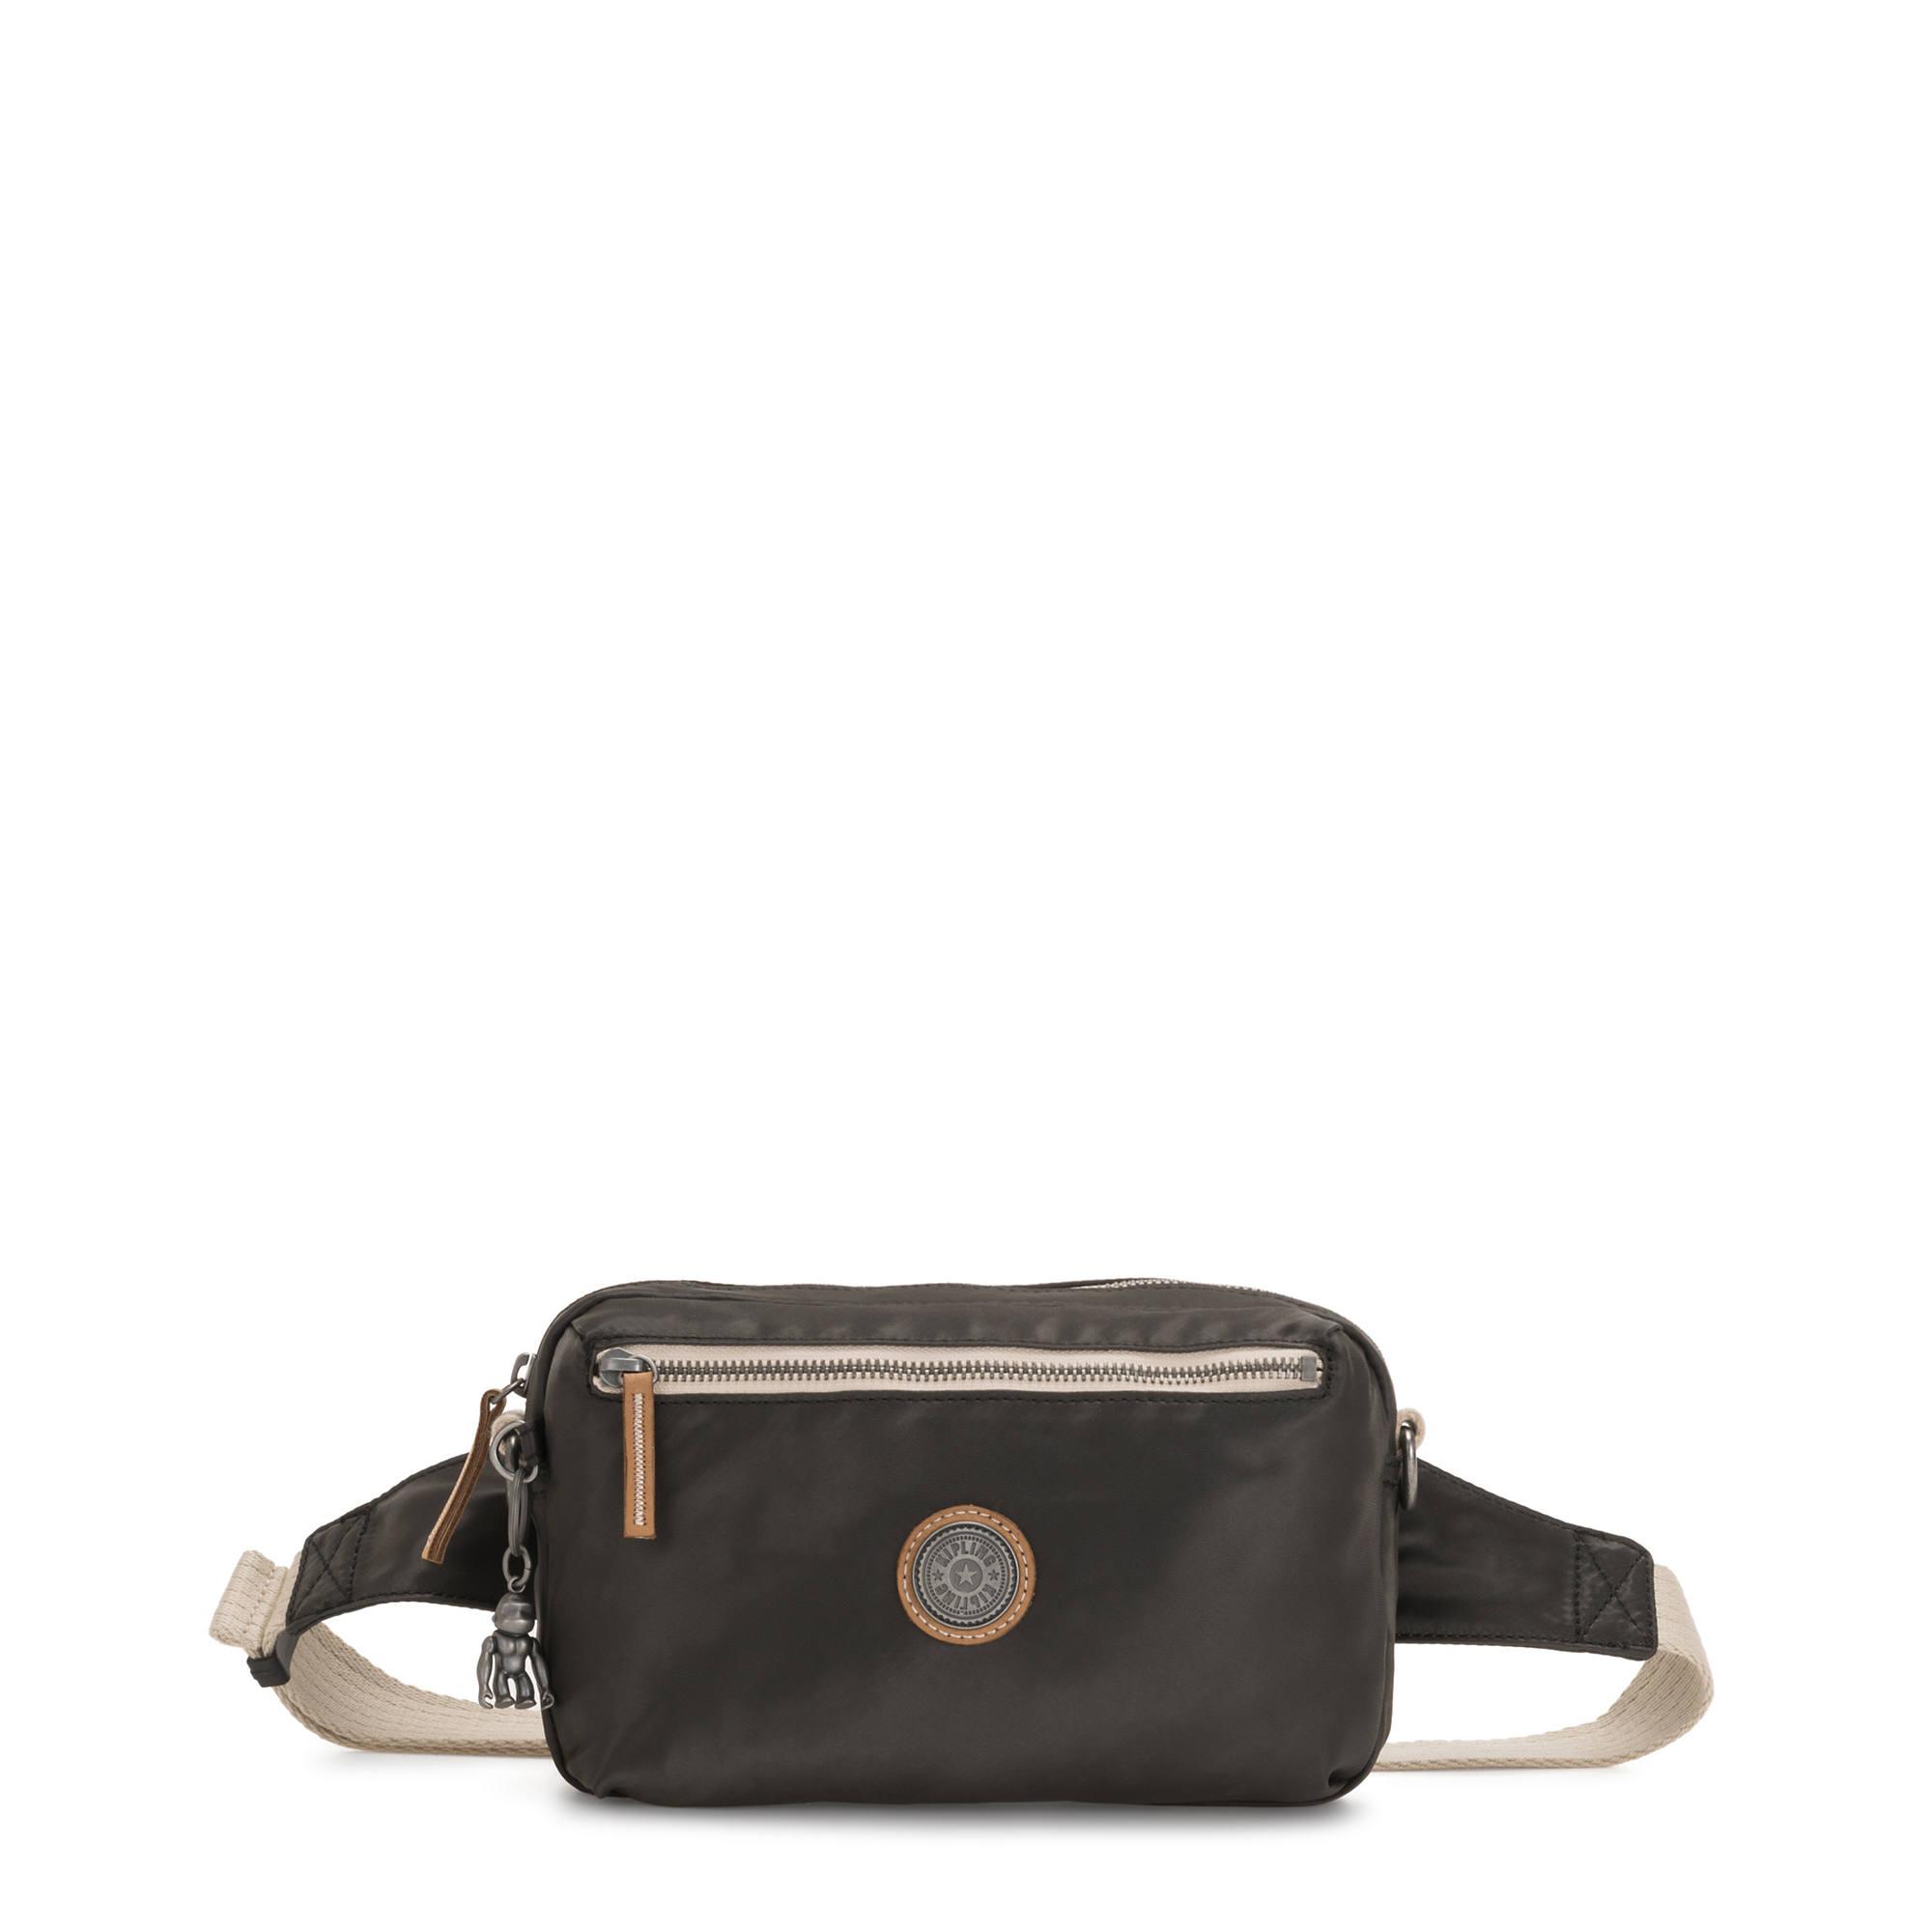 Halima 3 In 1 Convertible Waist Pack Crossbody Bag